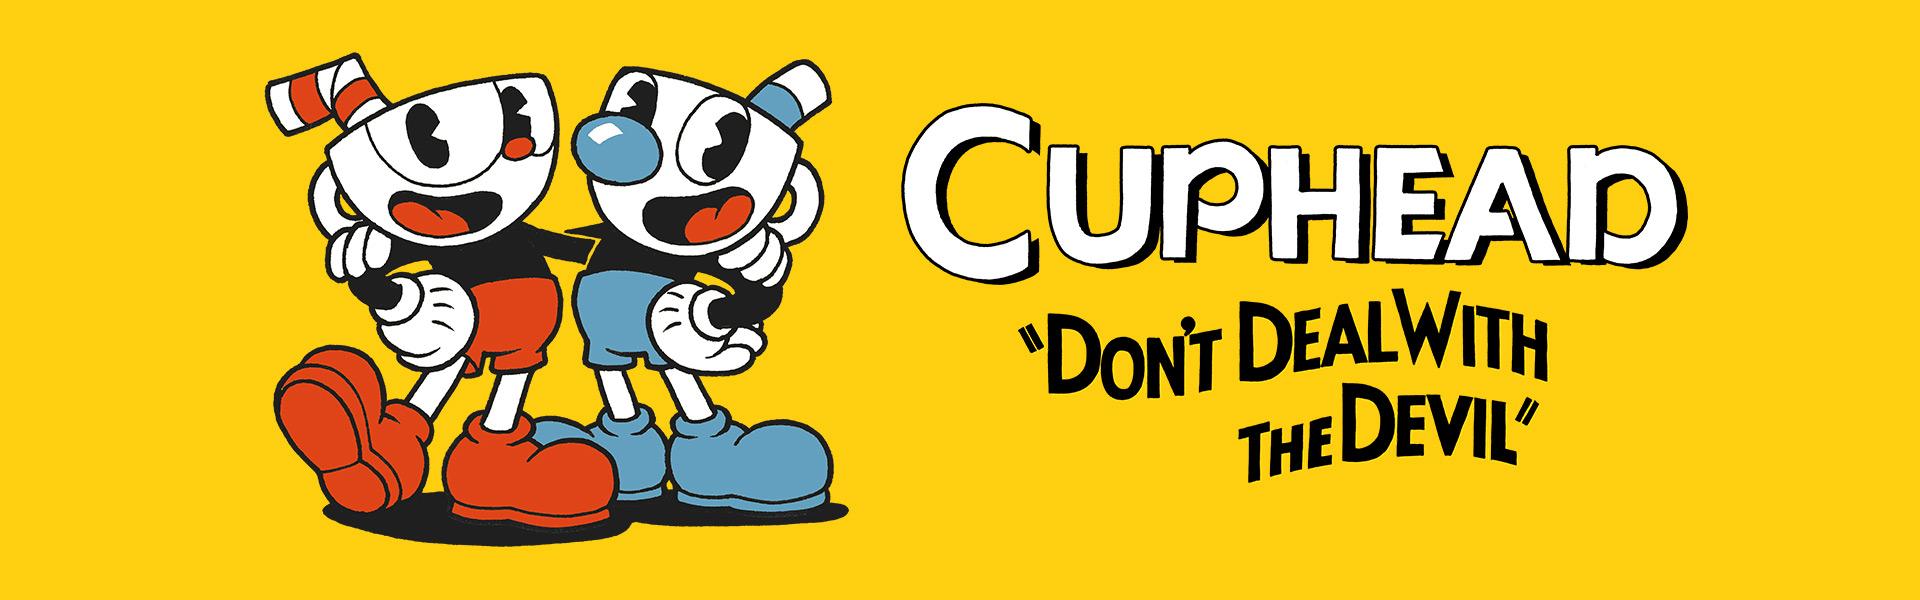 Cuphead PC (Steam) £10.49 @cdkeys